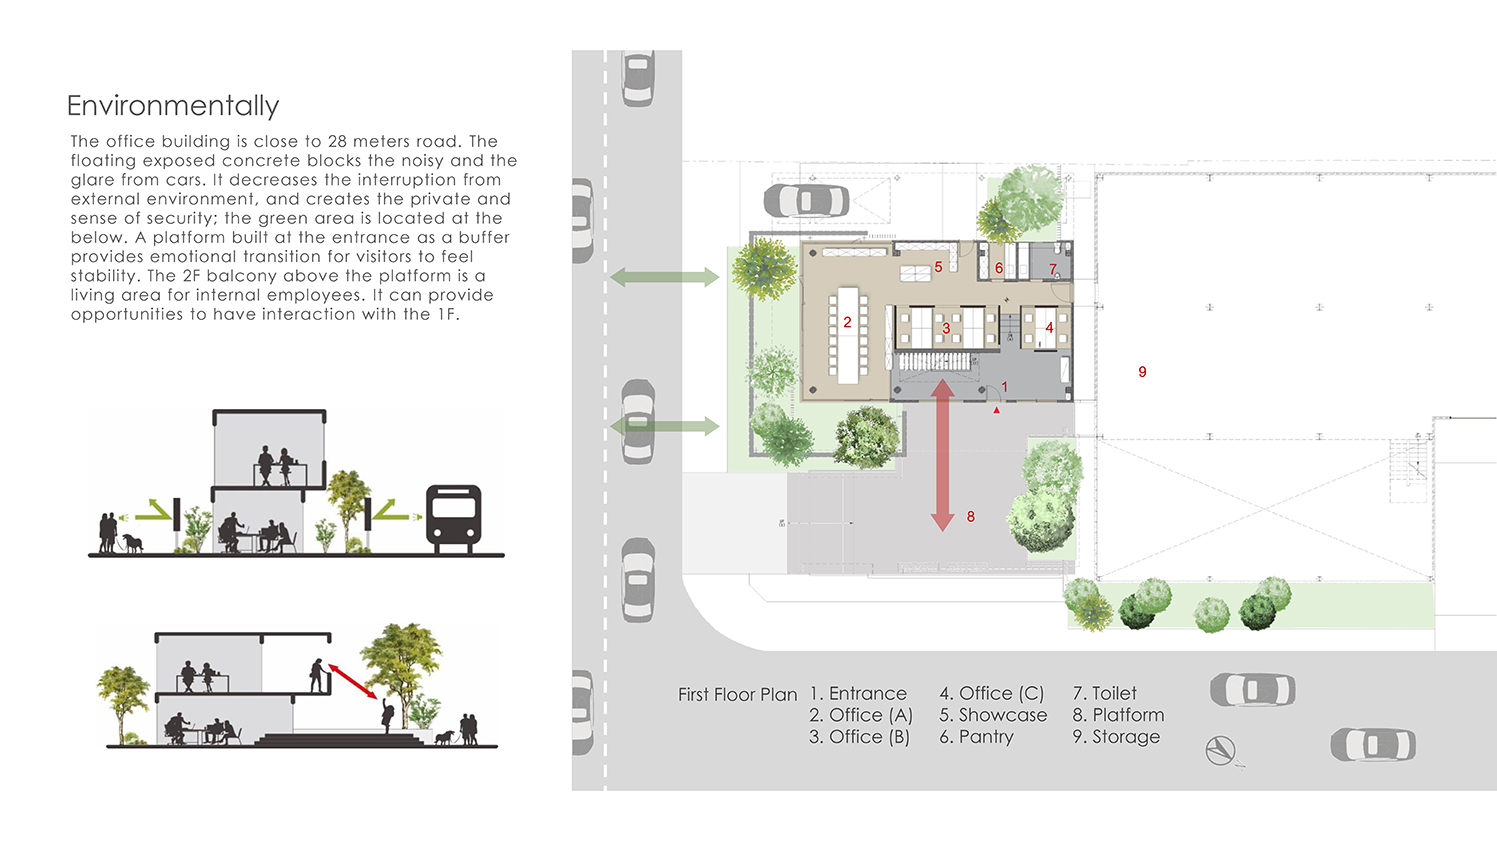 Environmentally Chain10 Architecture & Interior Design Institute}